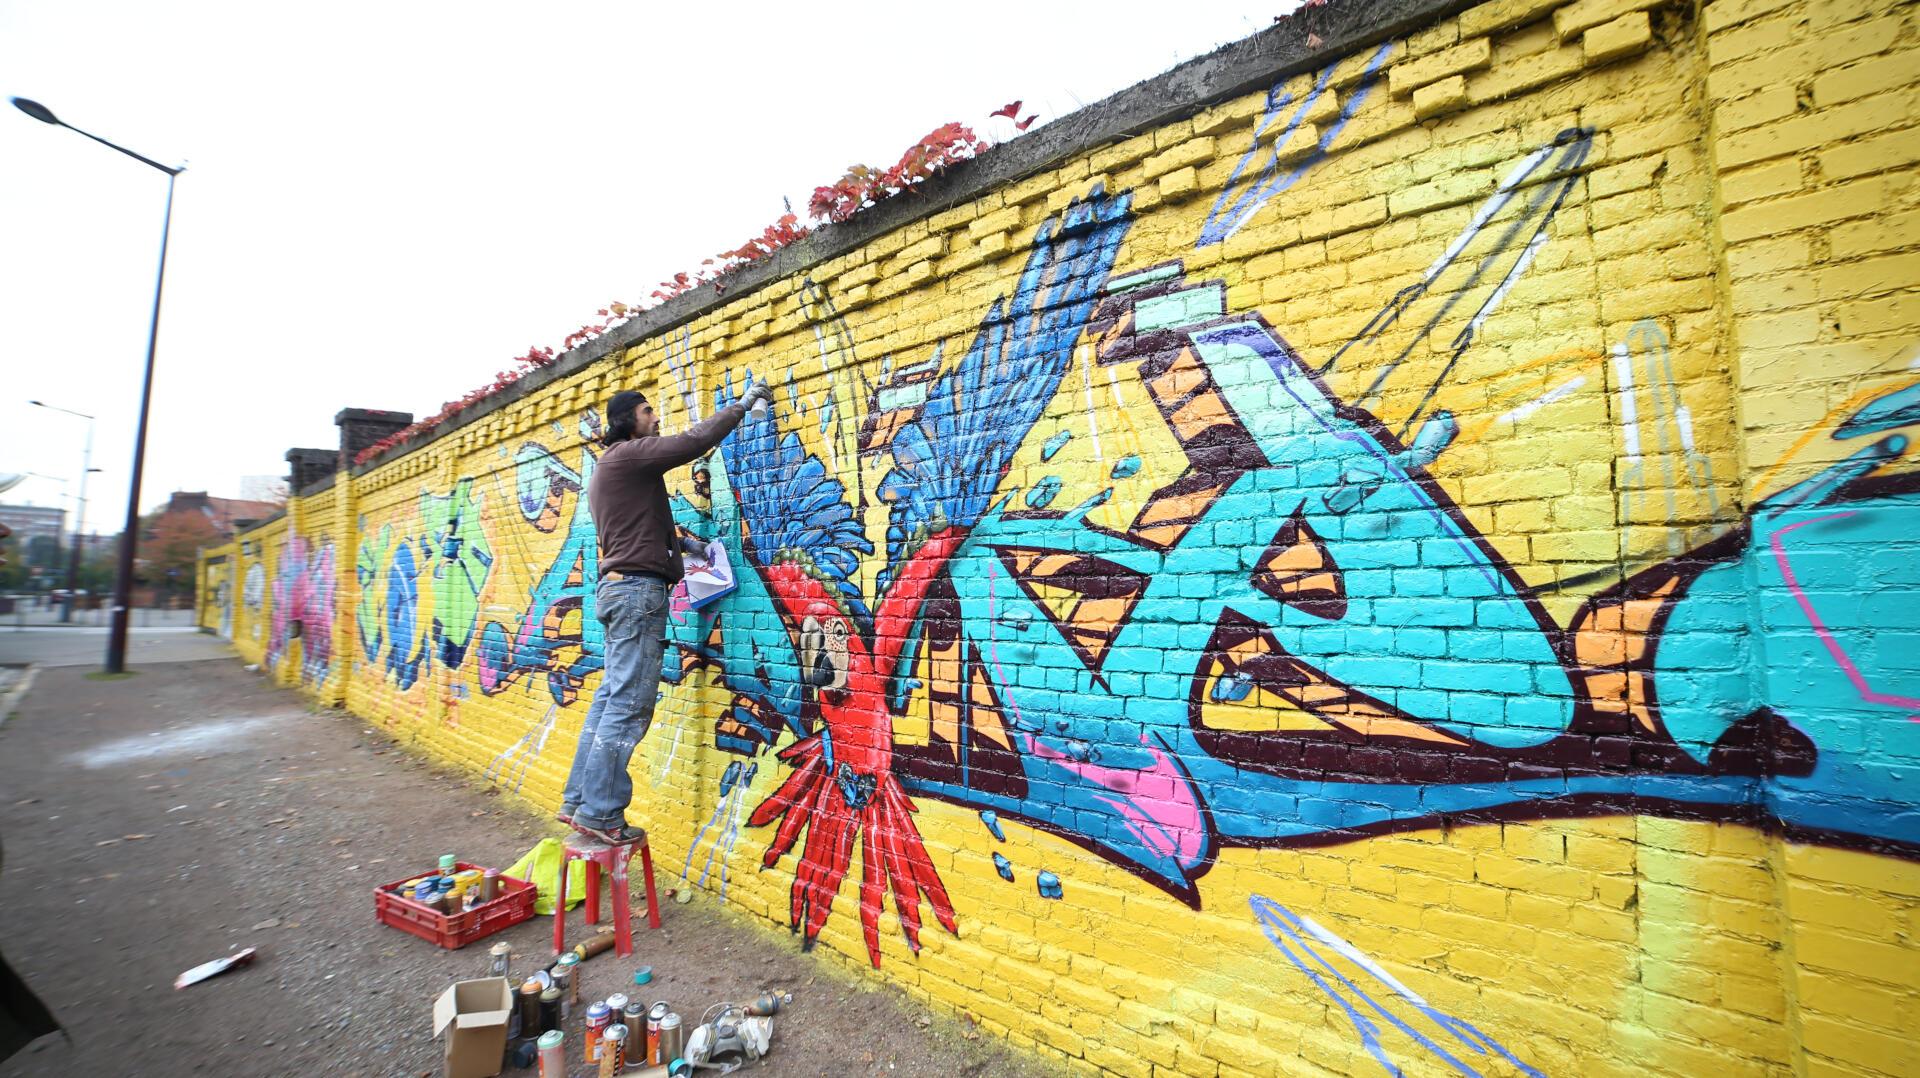 A BAZE D'ATOME #GRAFFITI #BDM 2015